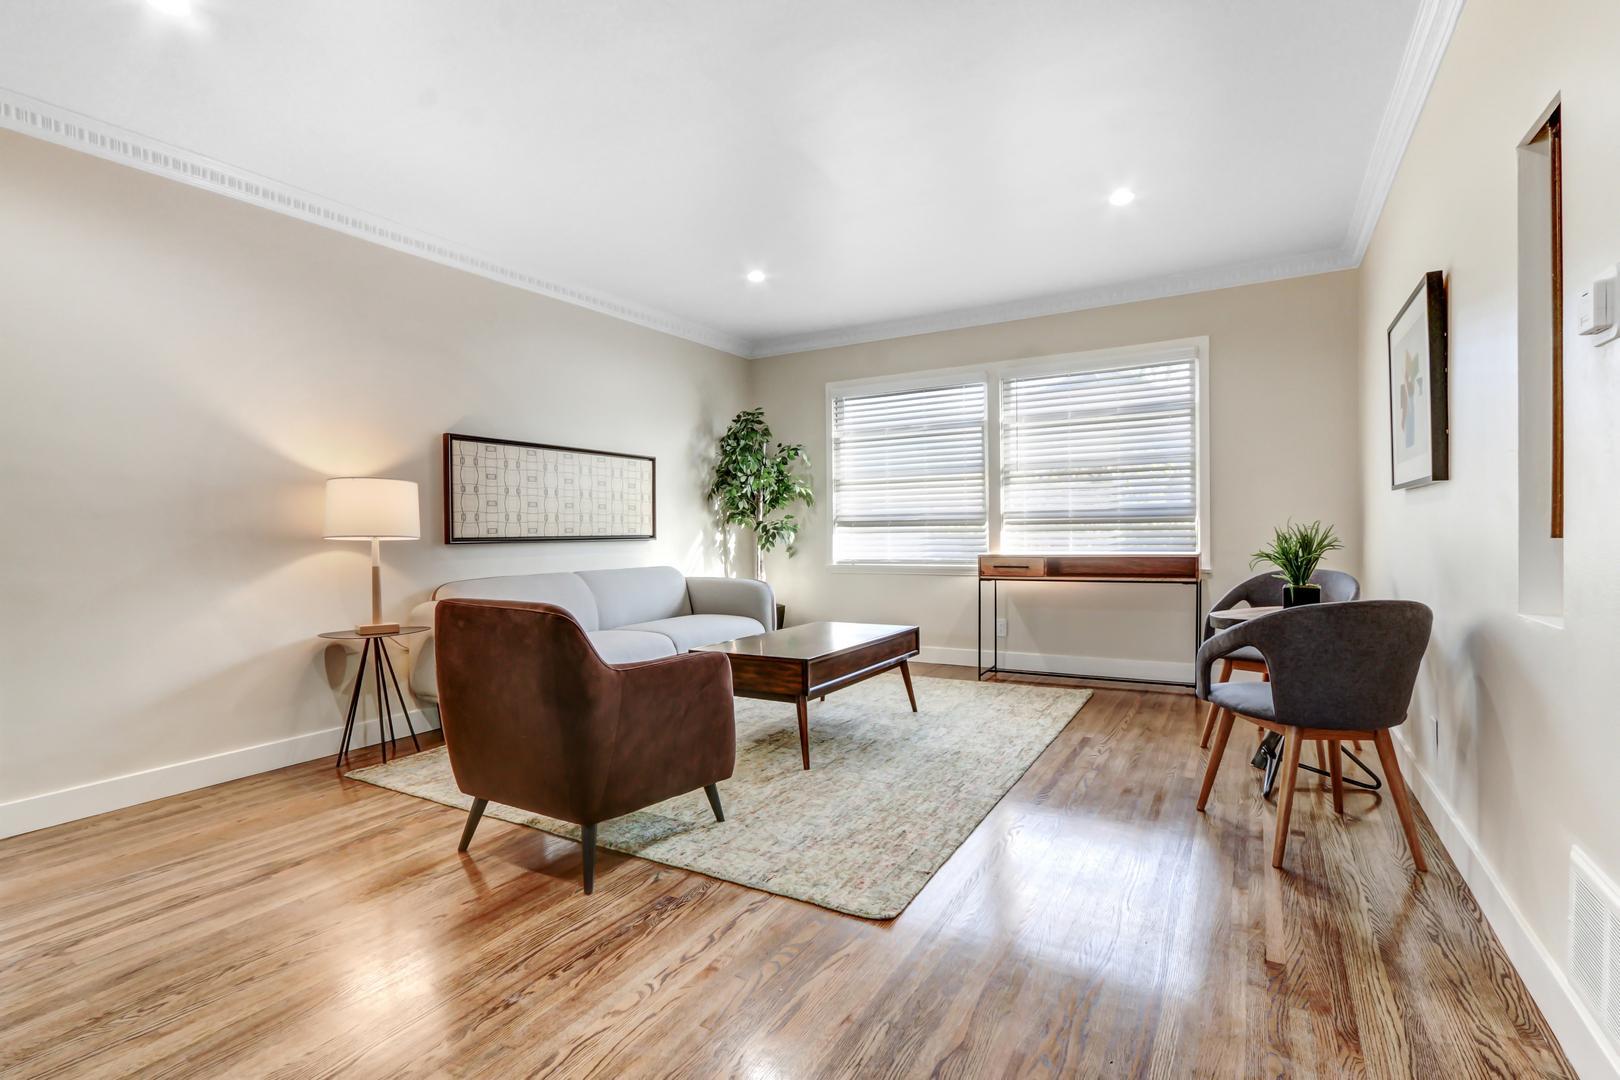 437 San Vicente Boulevard #439-A, Santa Monica, CA - $3,895 USD/ month